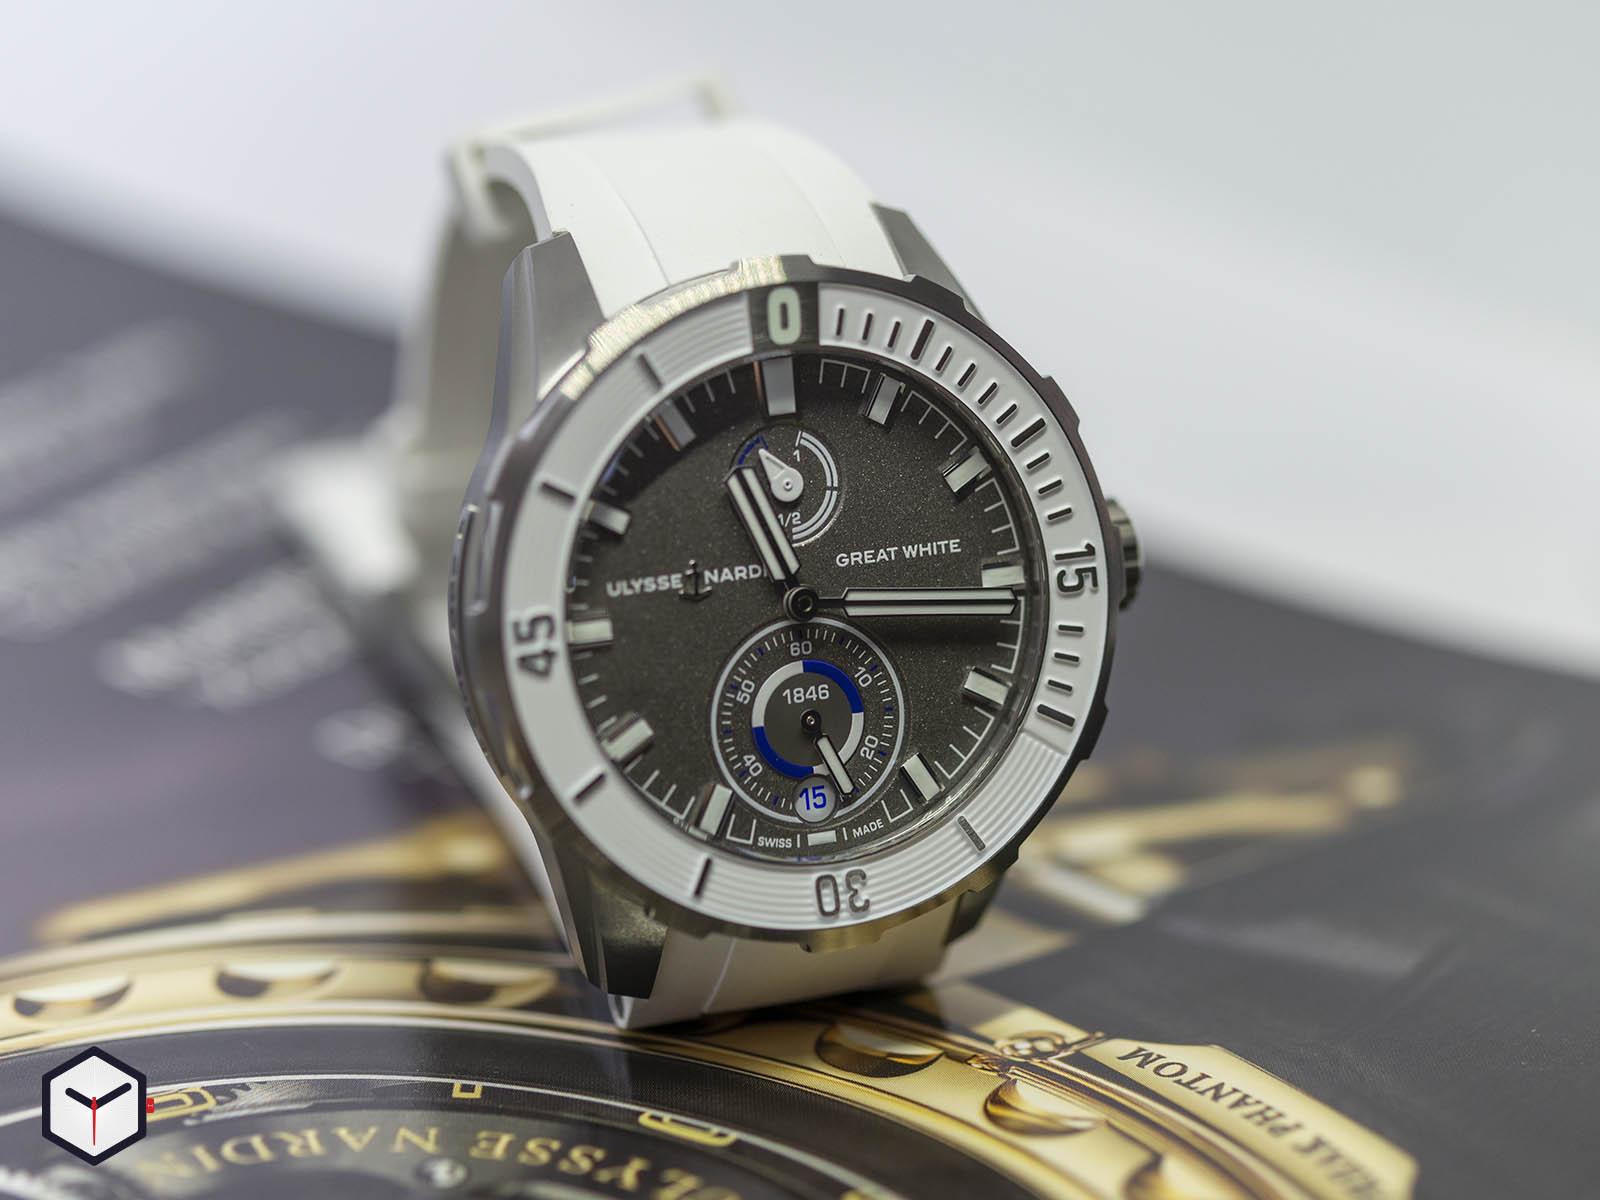 1183-170le-3-90-gw-ulysse-nardin-diver-chronometer-3.jpg